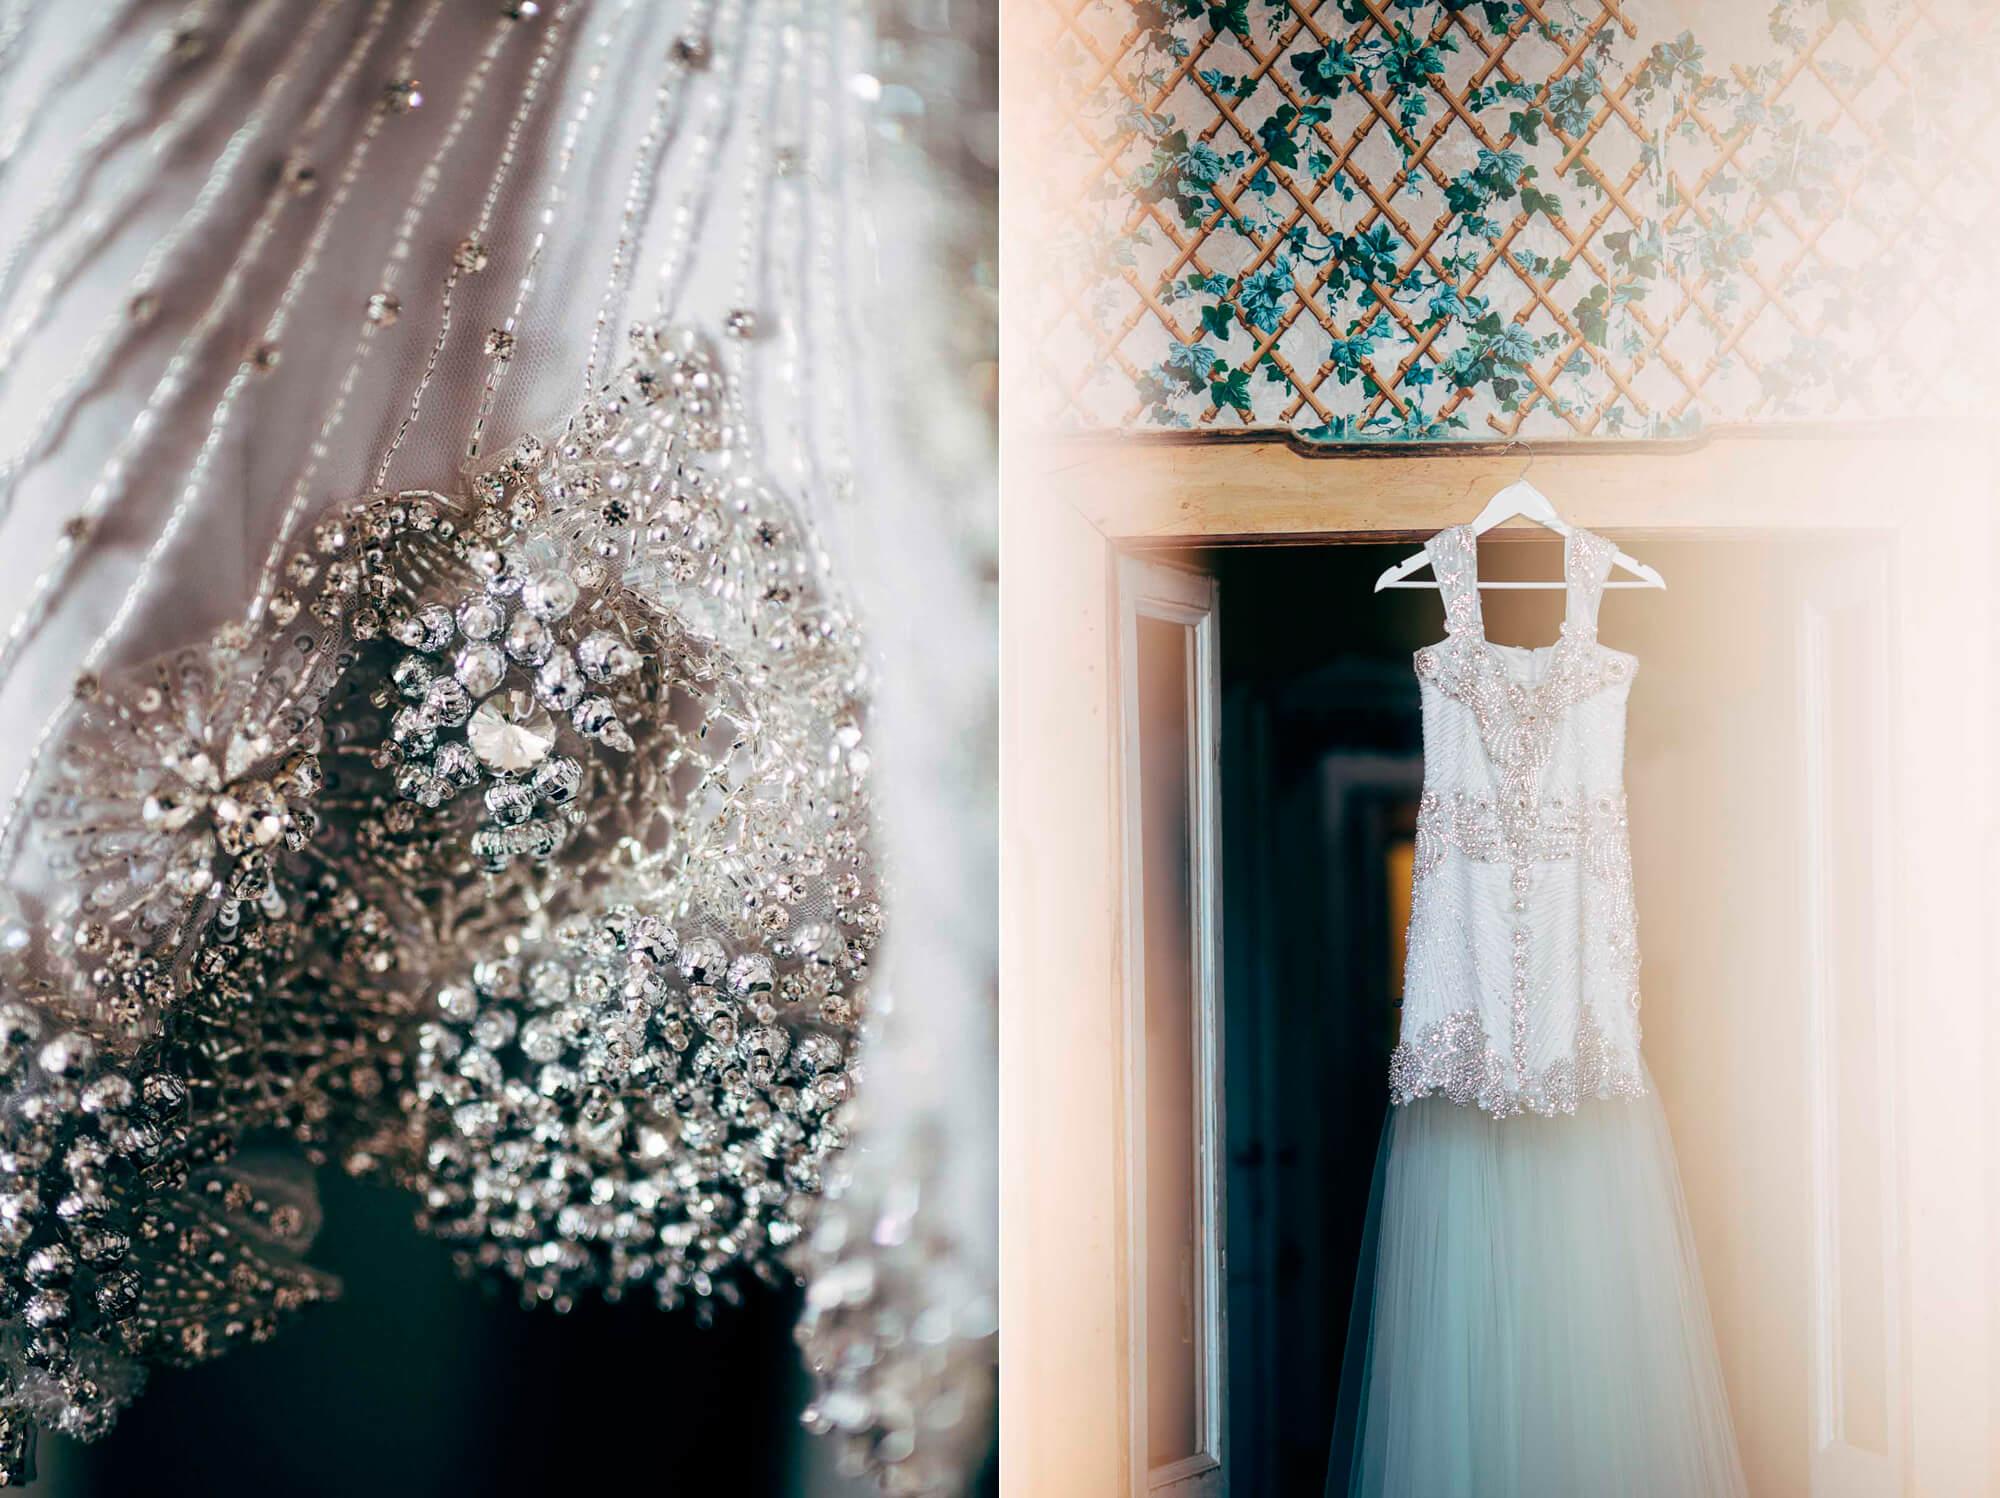 006-sorrento-wedding-photographer.jpg